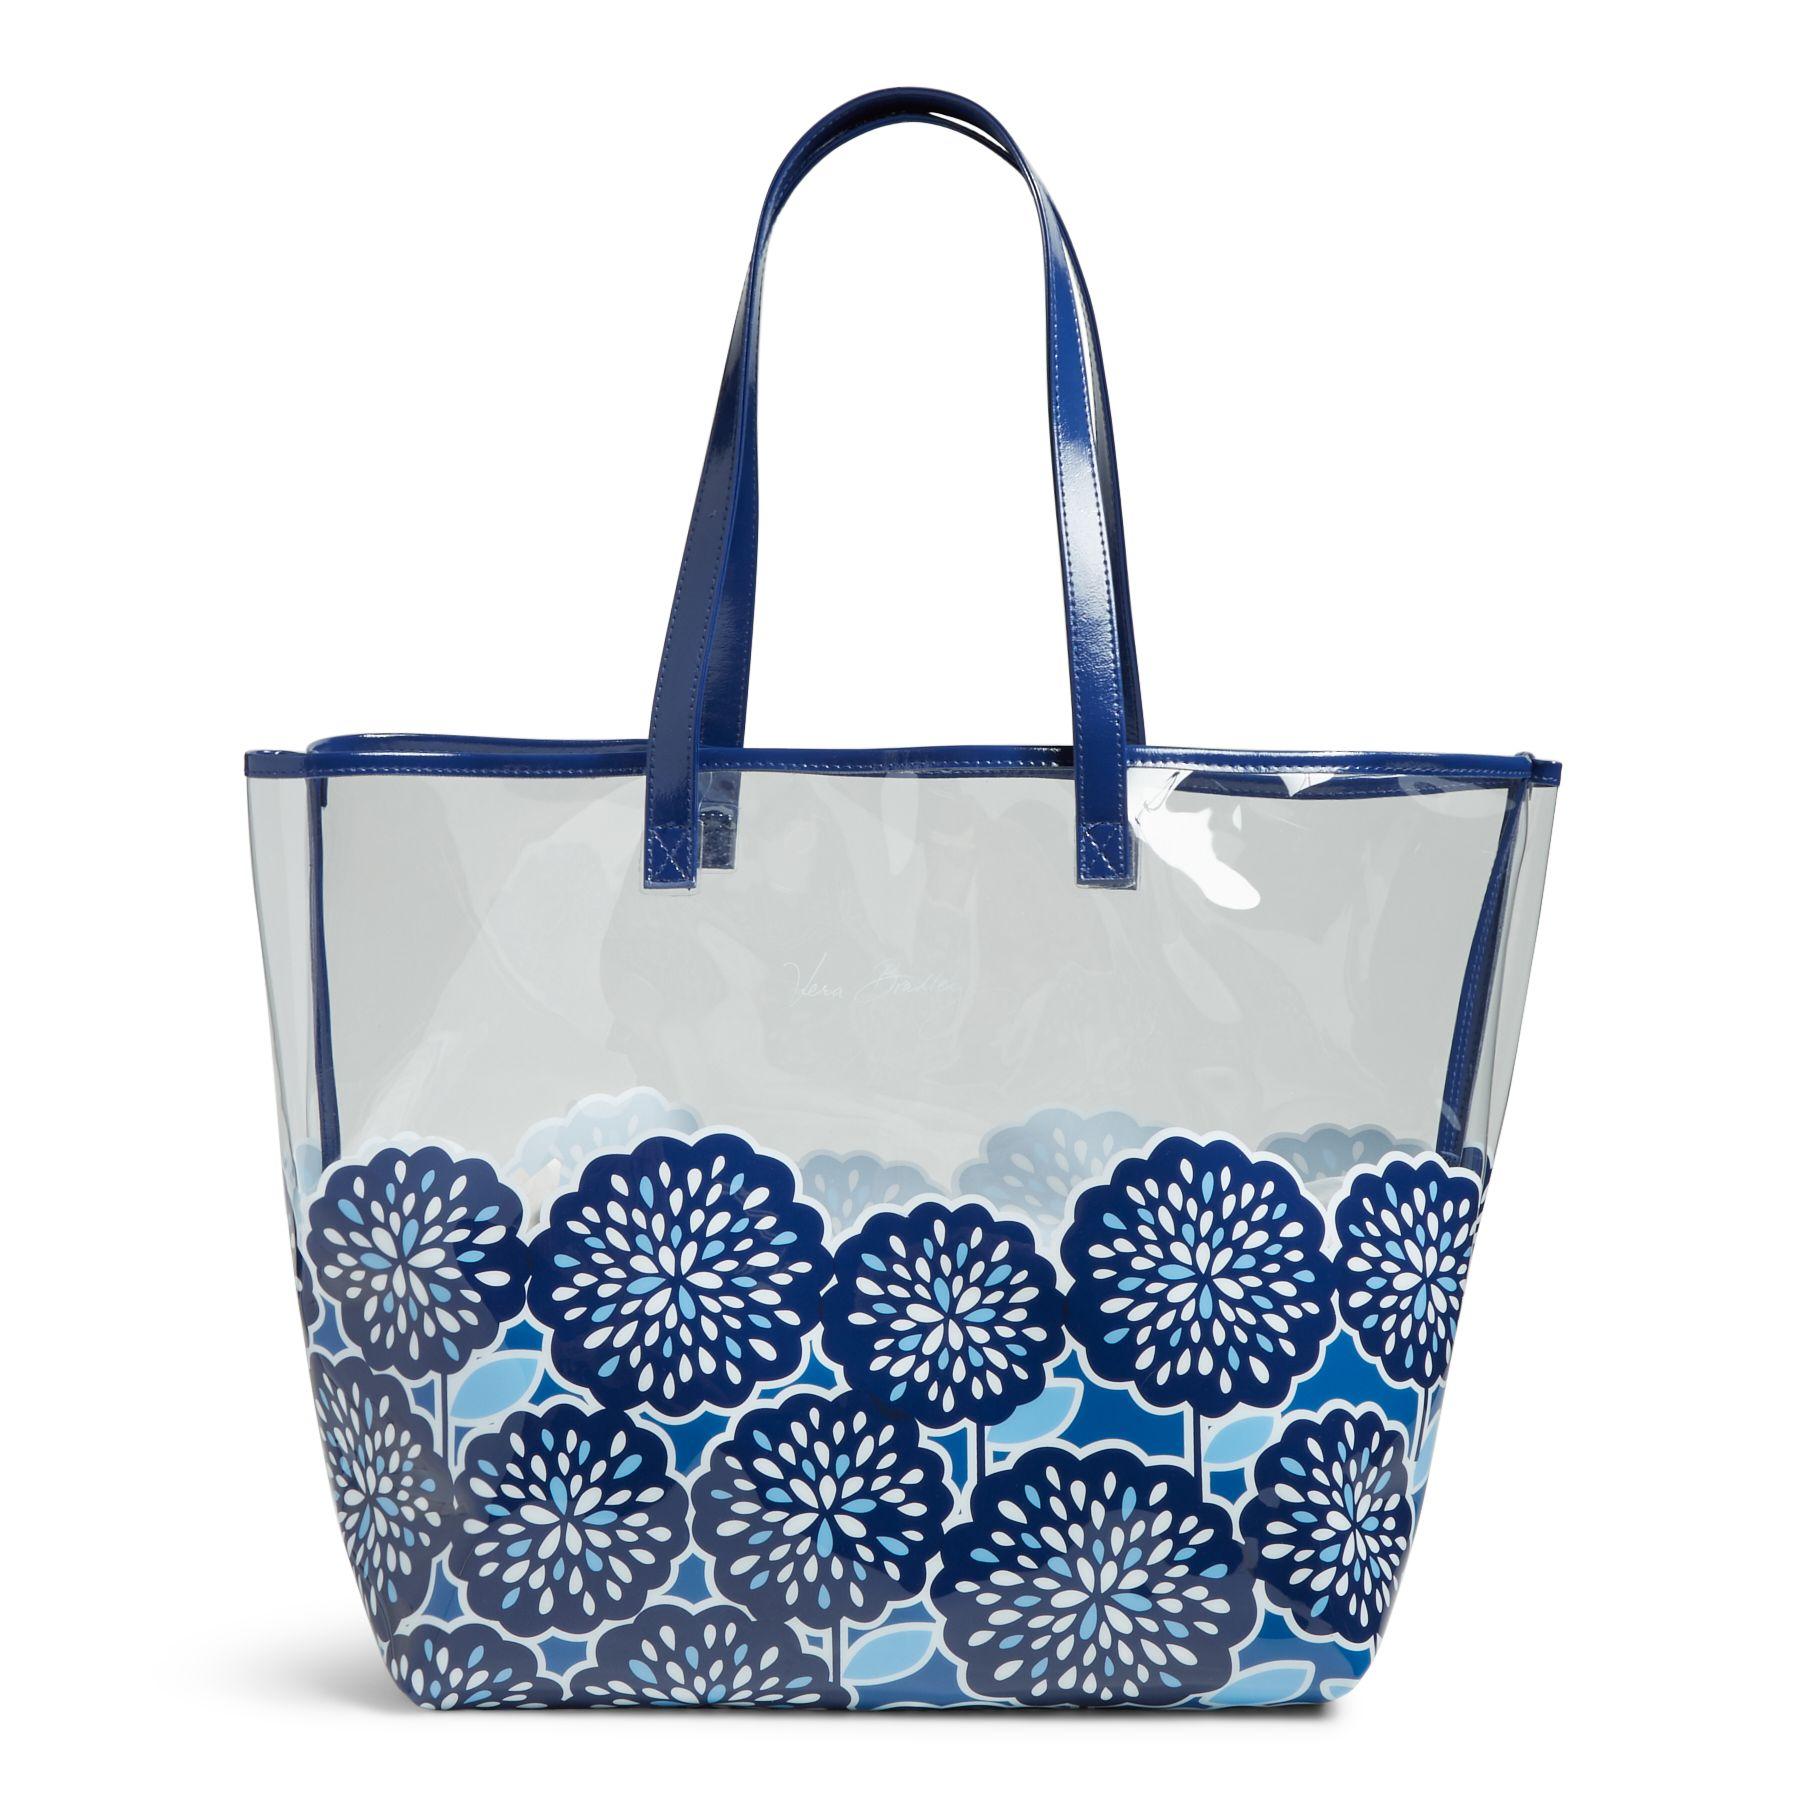 Vera Bradley Clearly Colorful Tote Bag Ebay